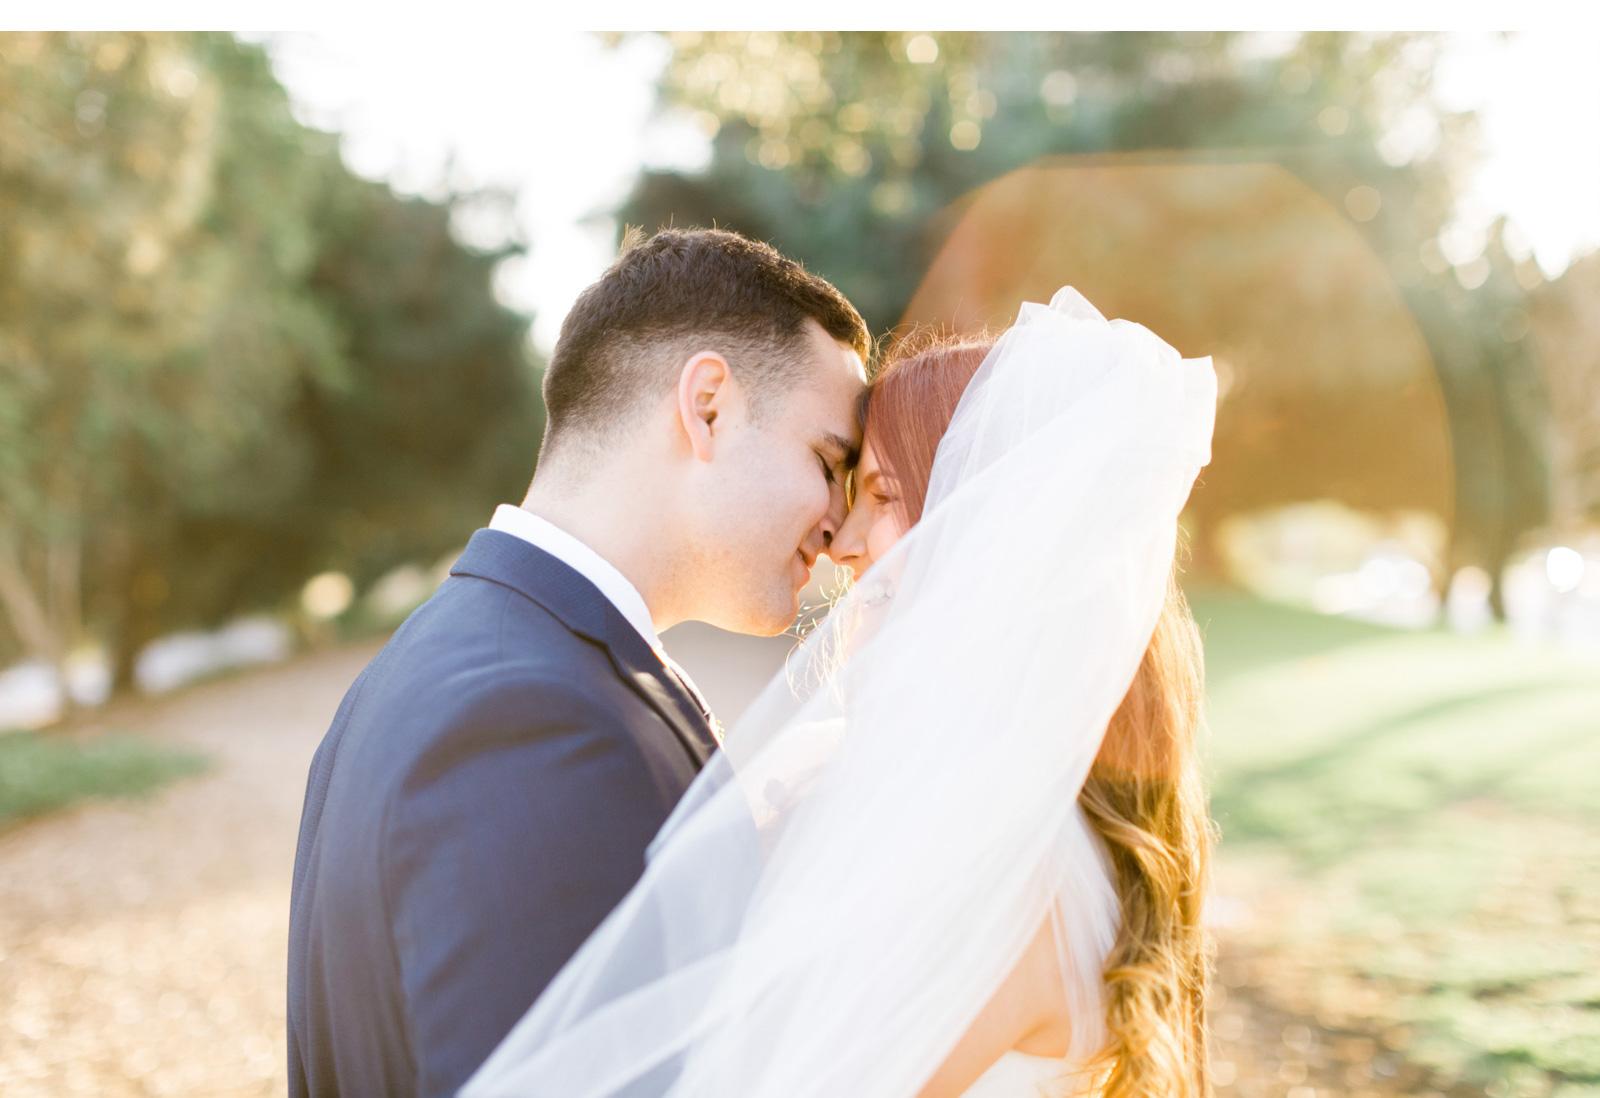 Jon-&-Amanda-Dougher's-Backyard-Wedding-Natalie-Schutt-Photography_03.jpg